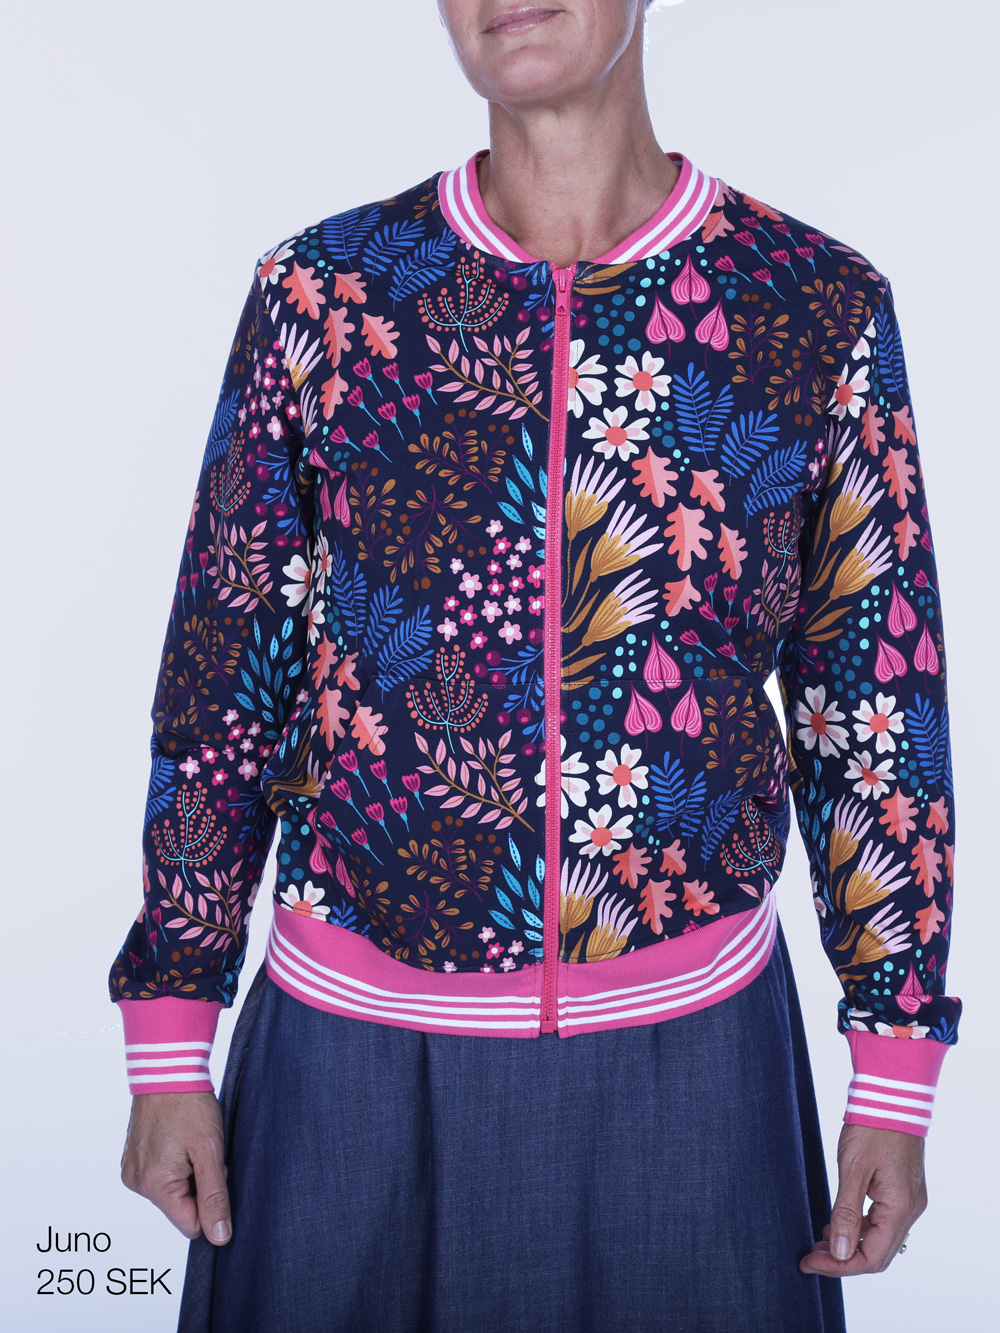 sewing_pattern_mf_juno5g